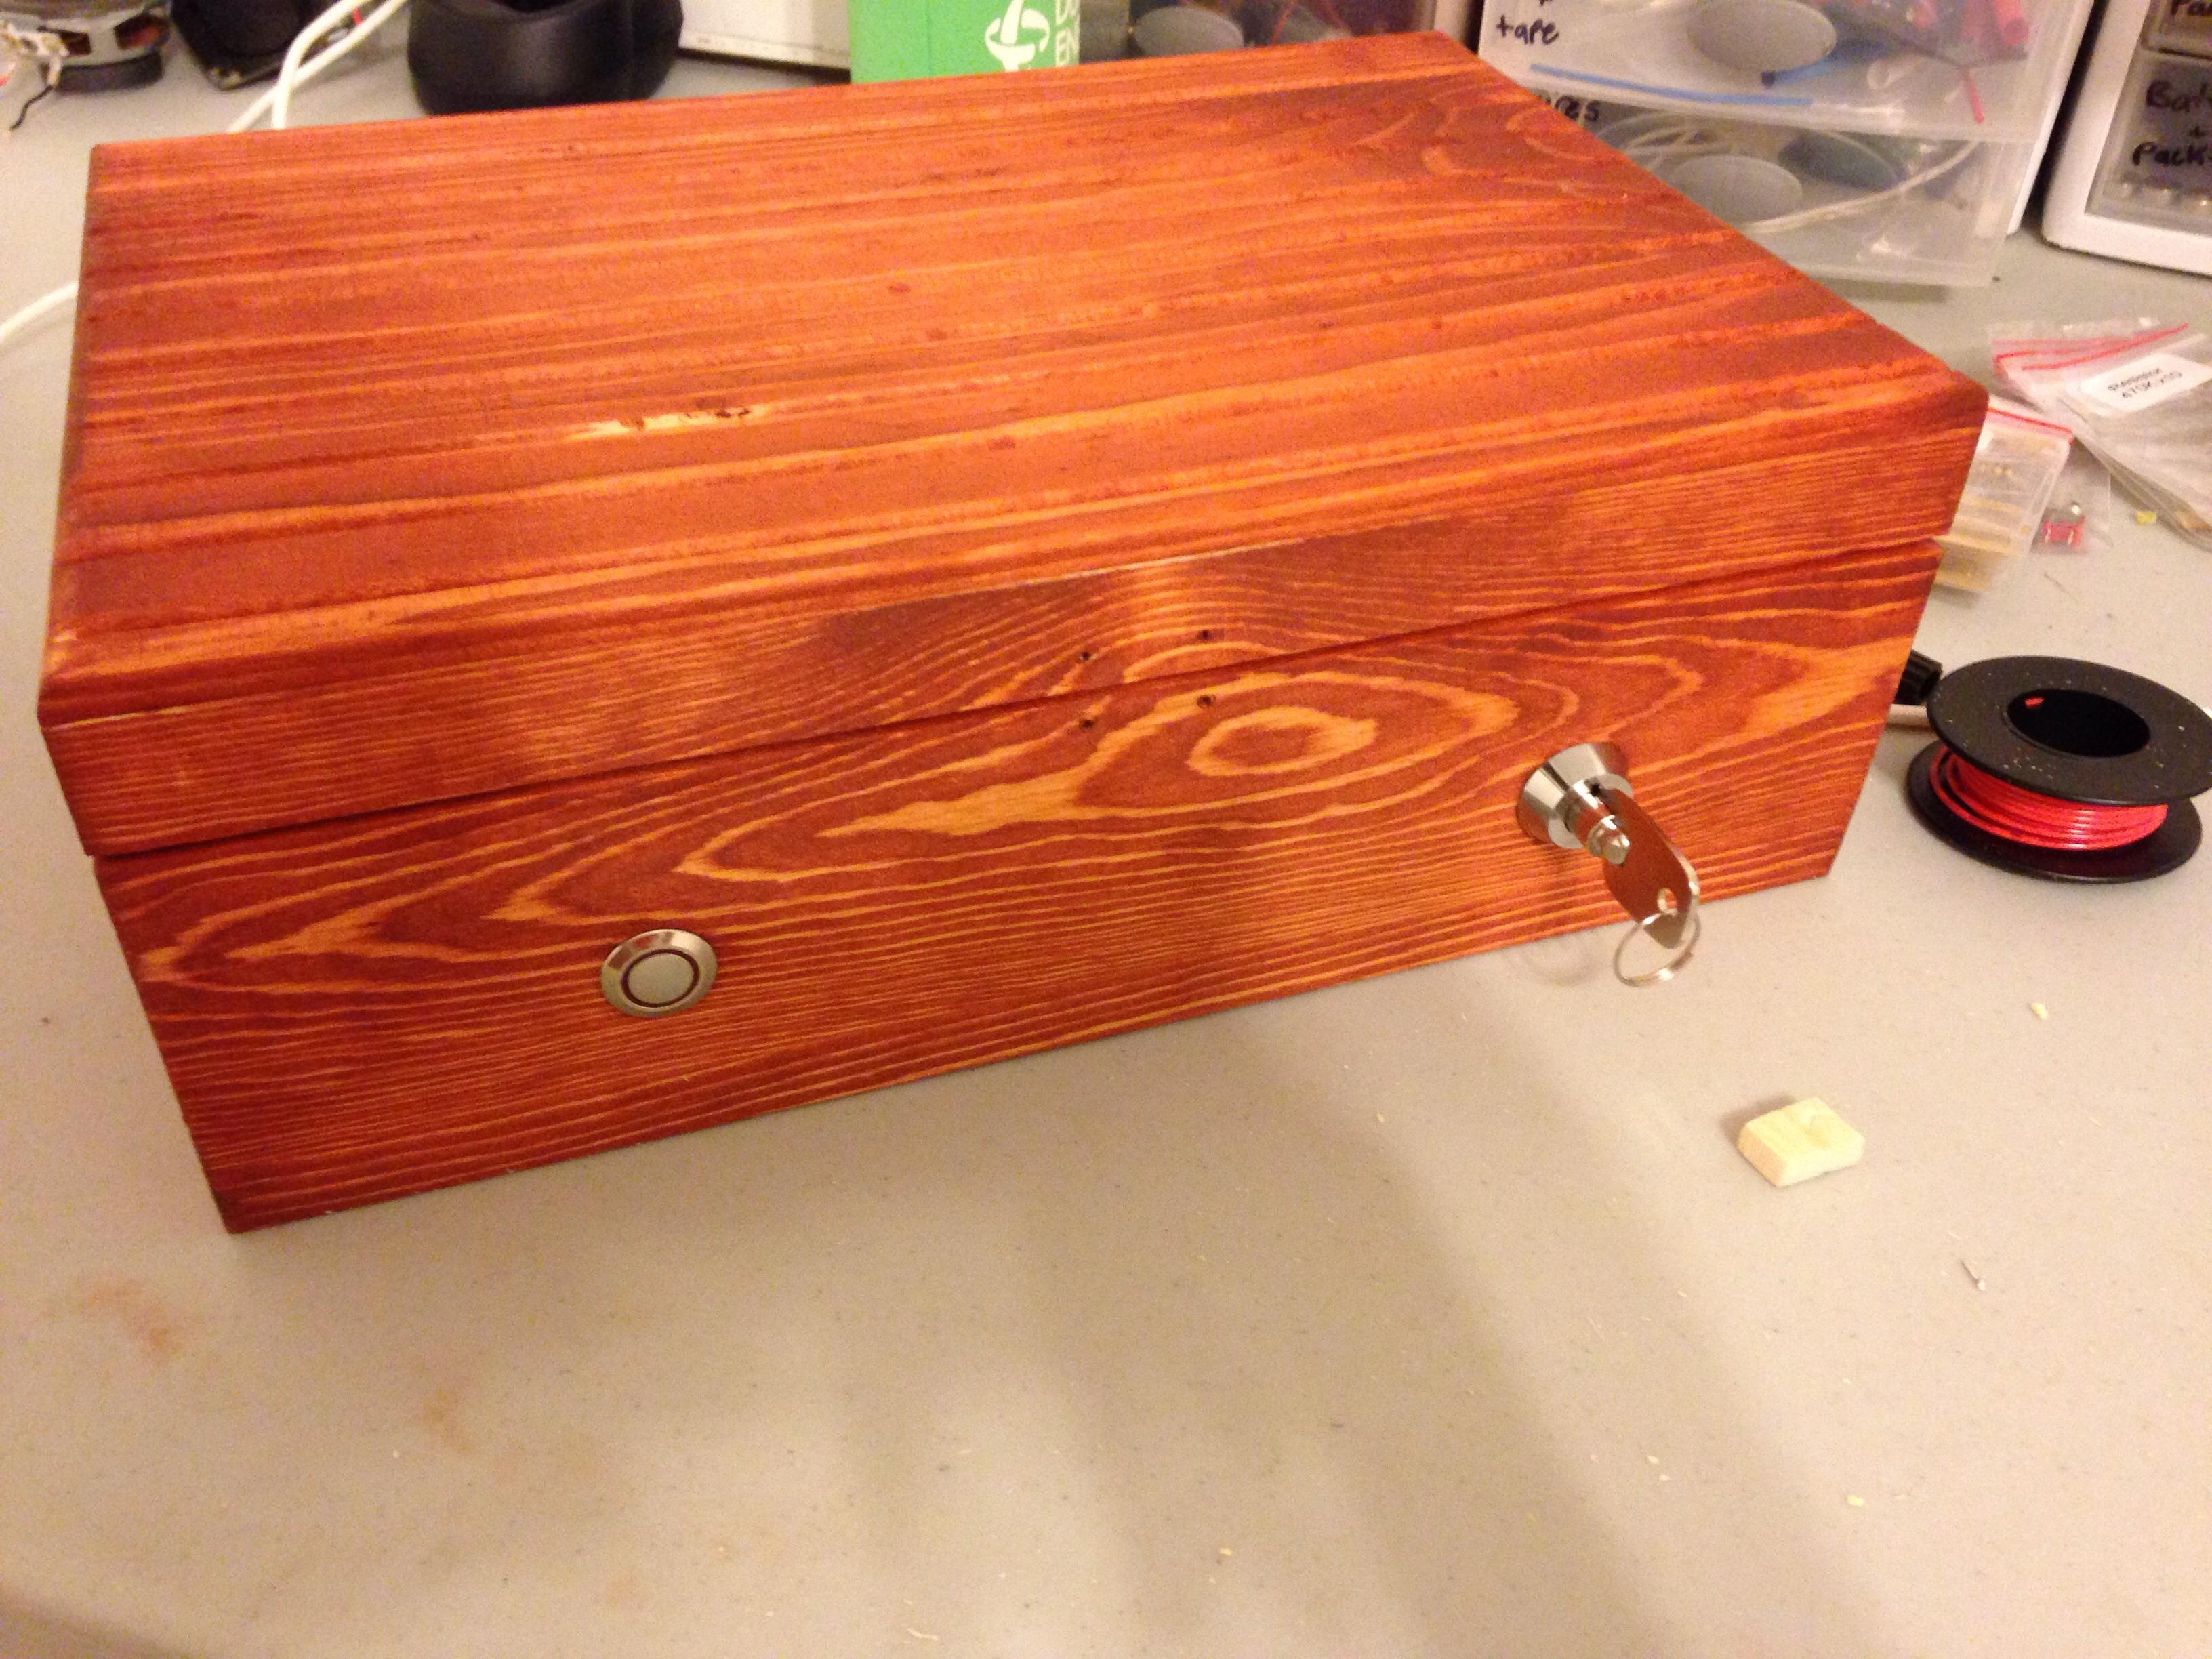 Wooden Lockbox With Key Access